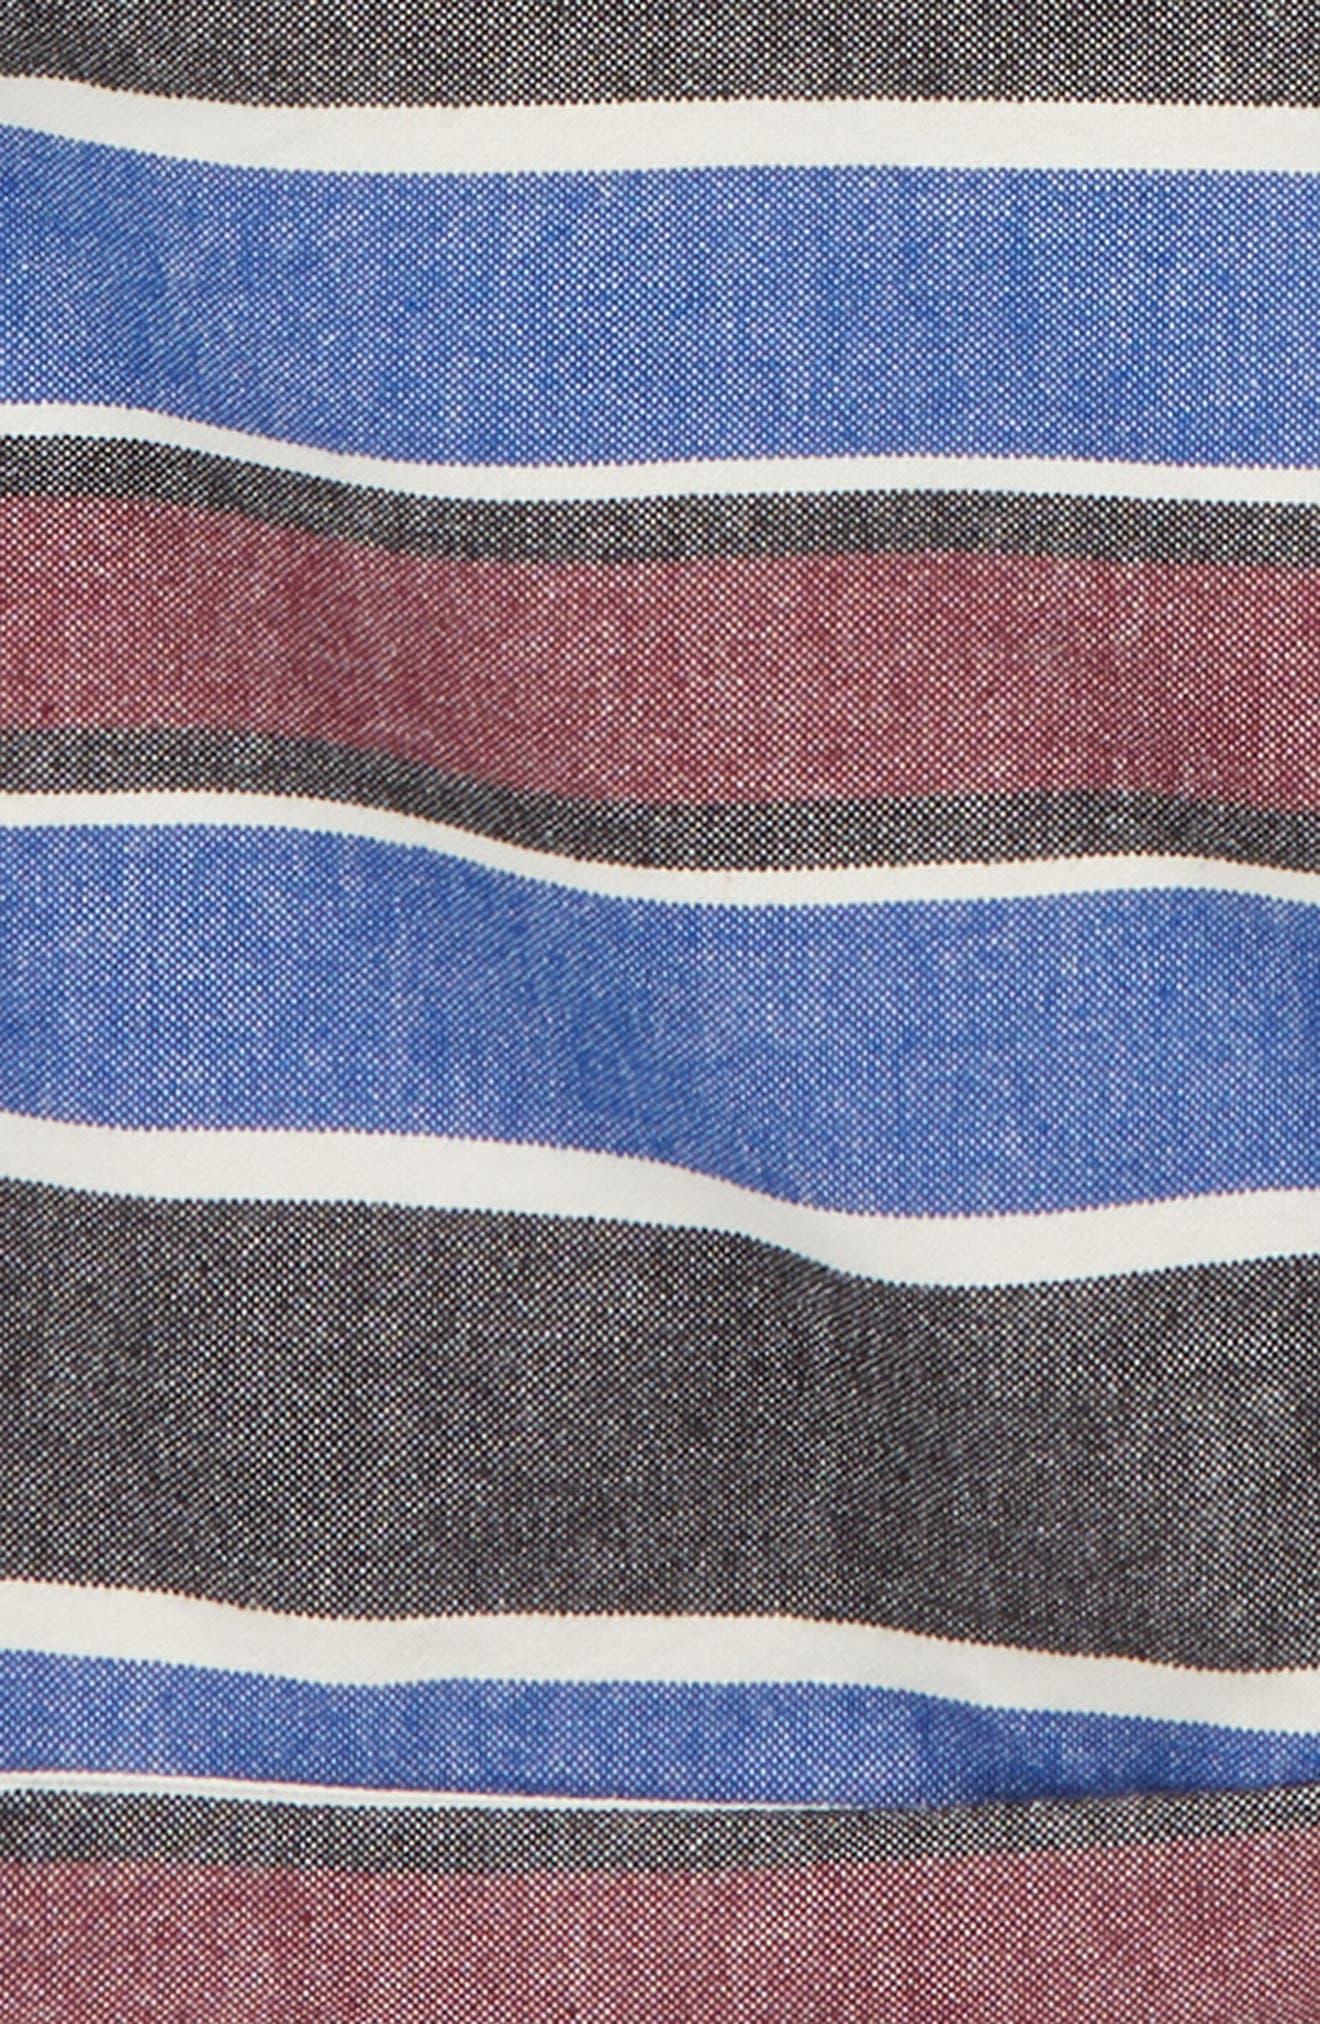 Stripe Chino Shorts,                             Alternate thumbnail 2, color,                             400